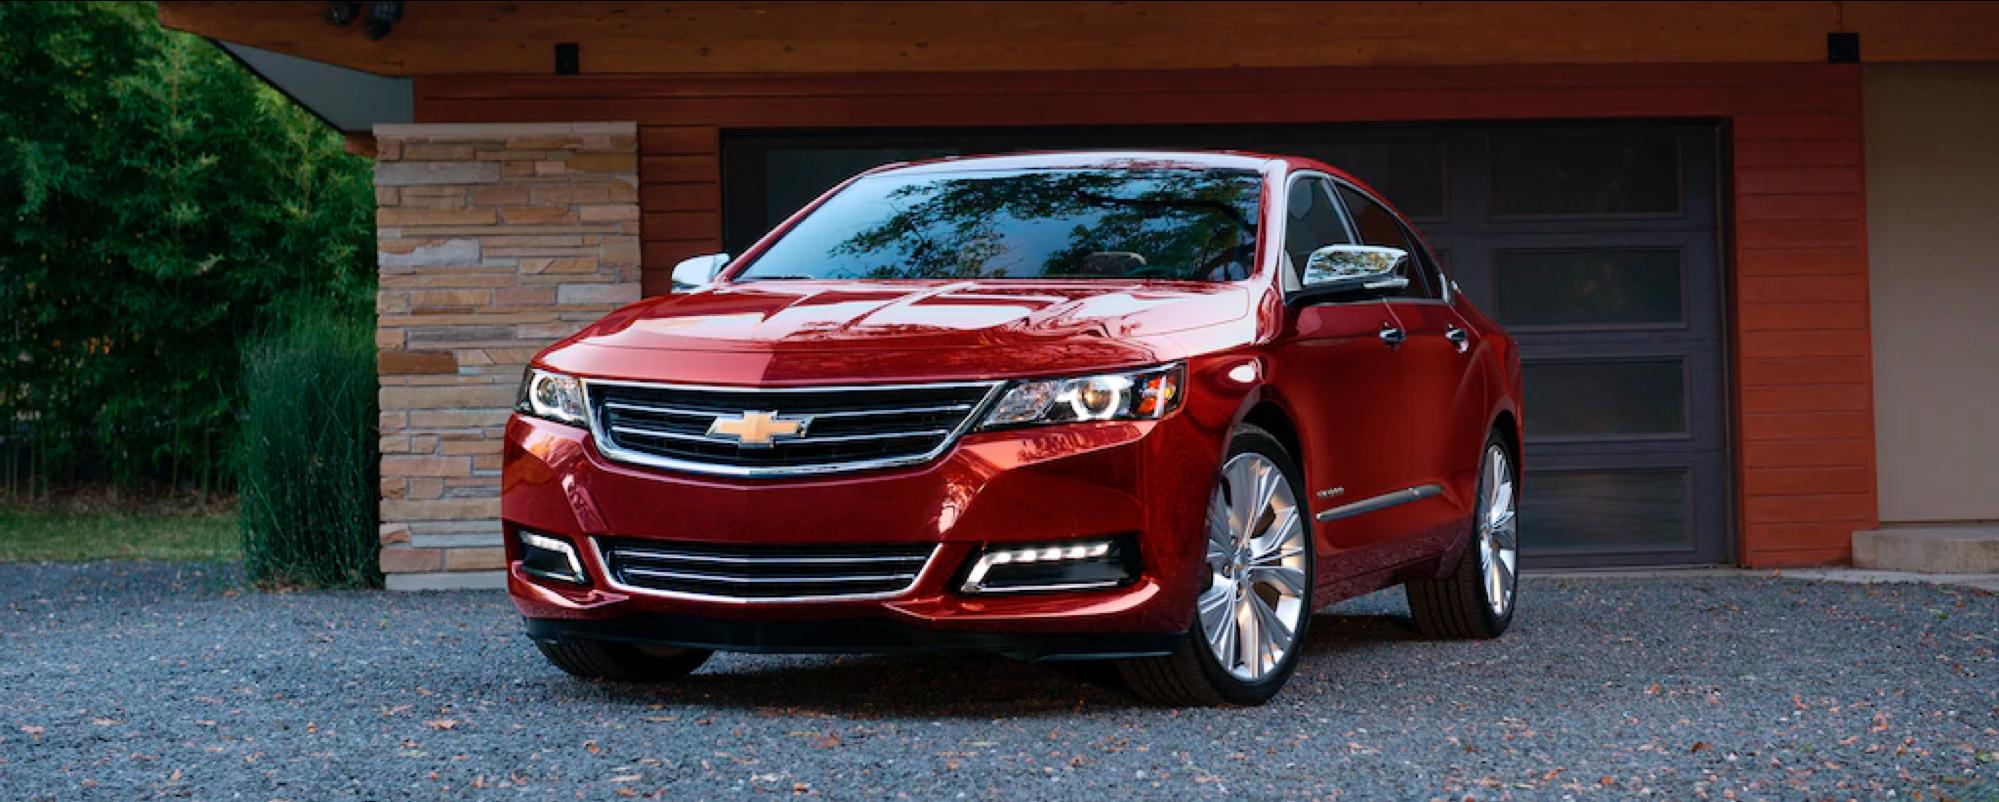 New Release 2020 Chevrolet Impala